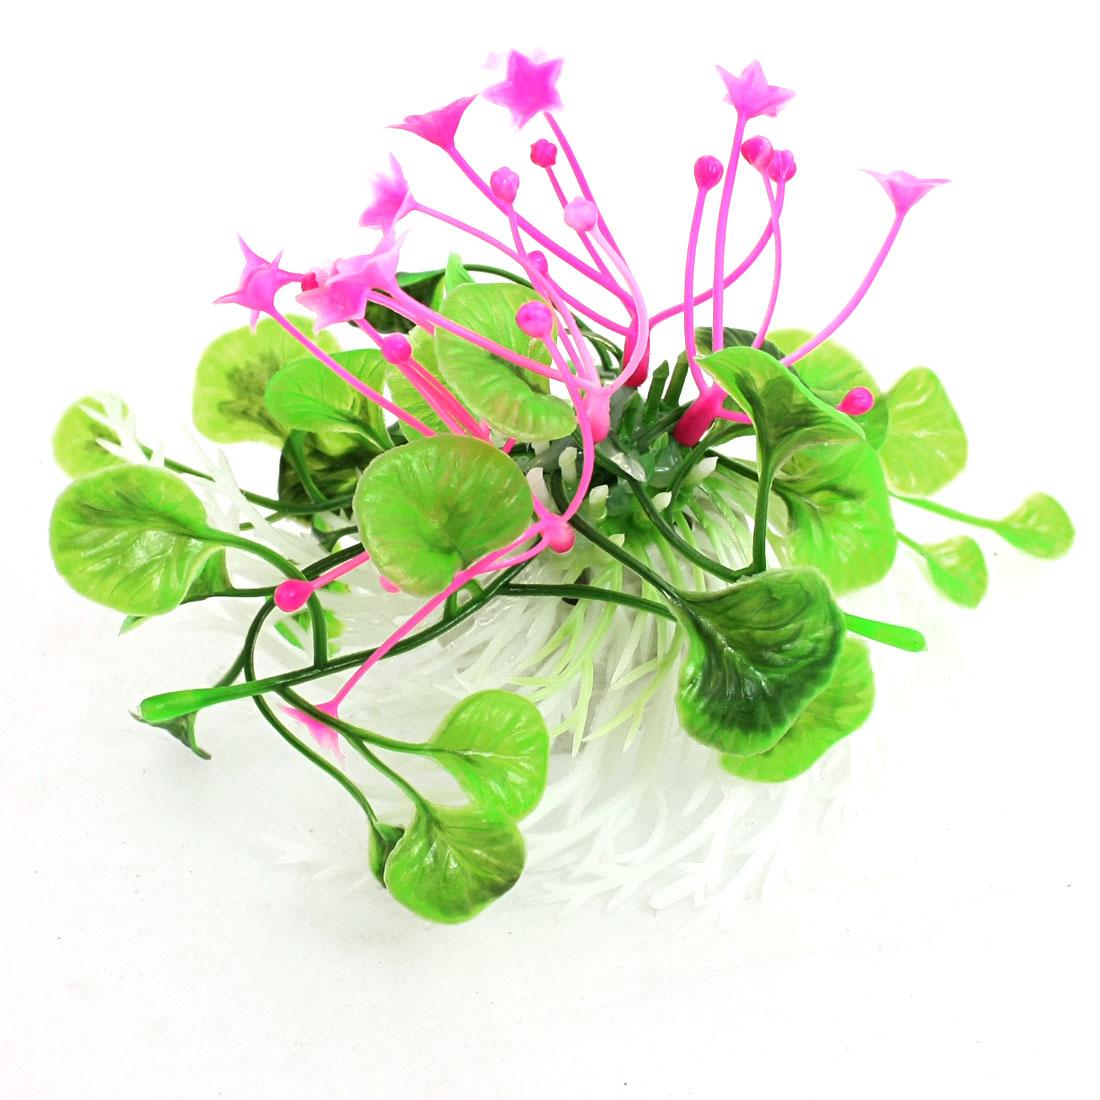 Fuchsia Star Accent Green Plastic Plants Ornament for Fish Tank